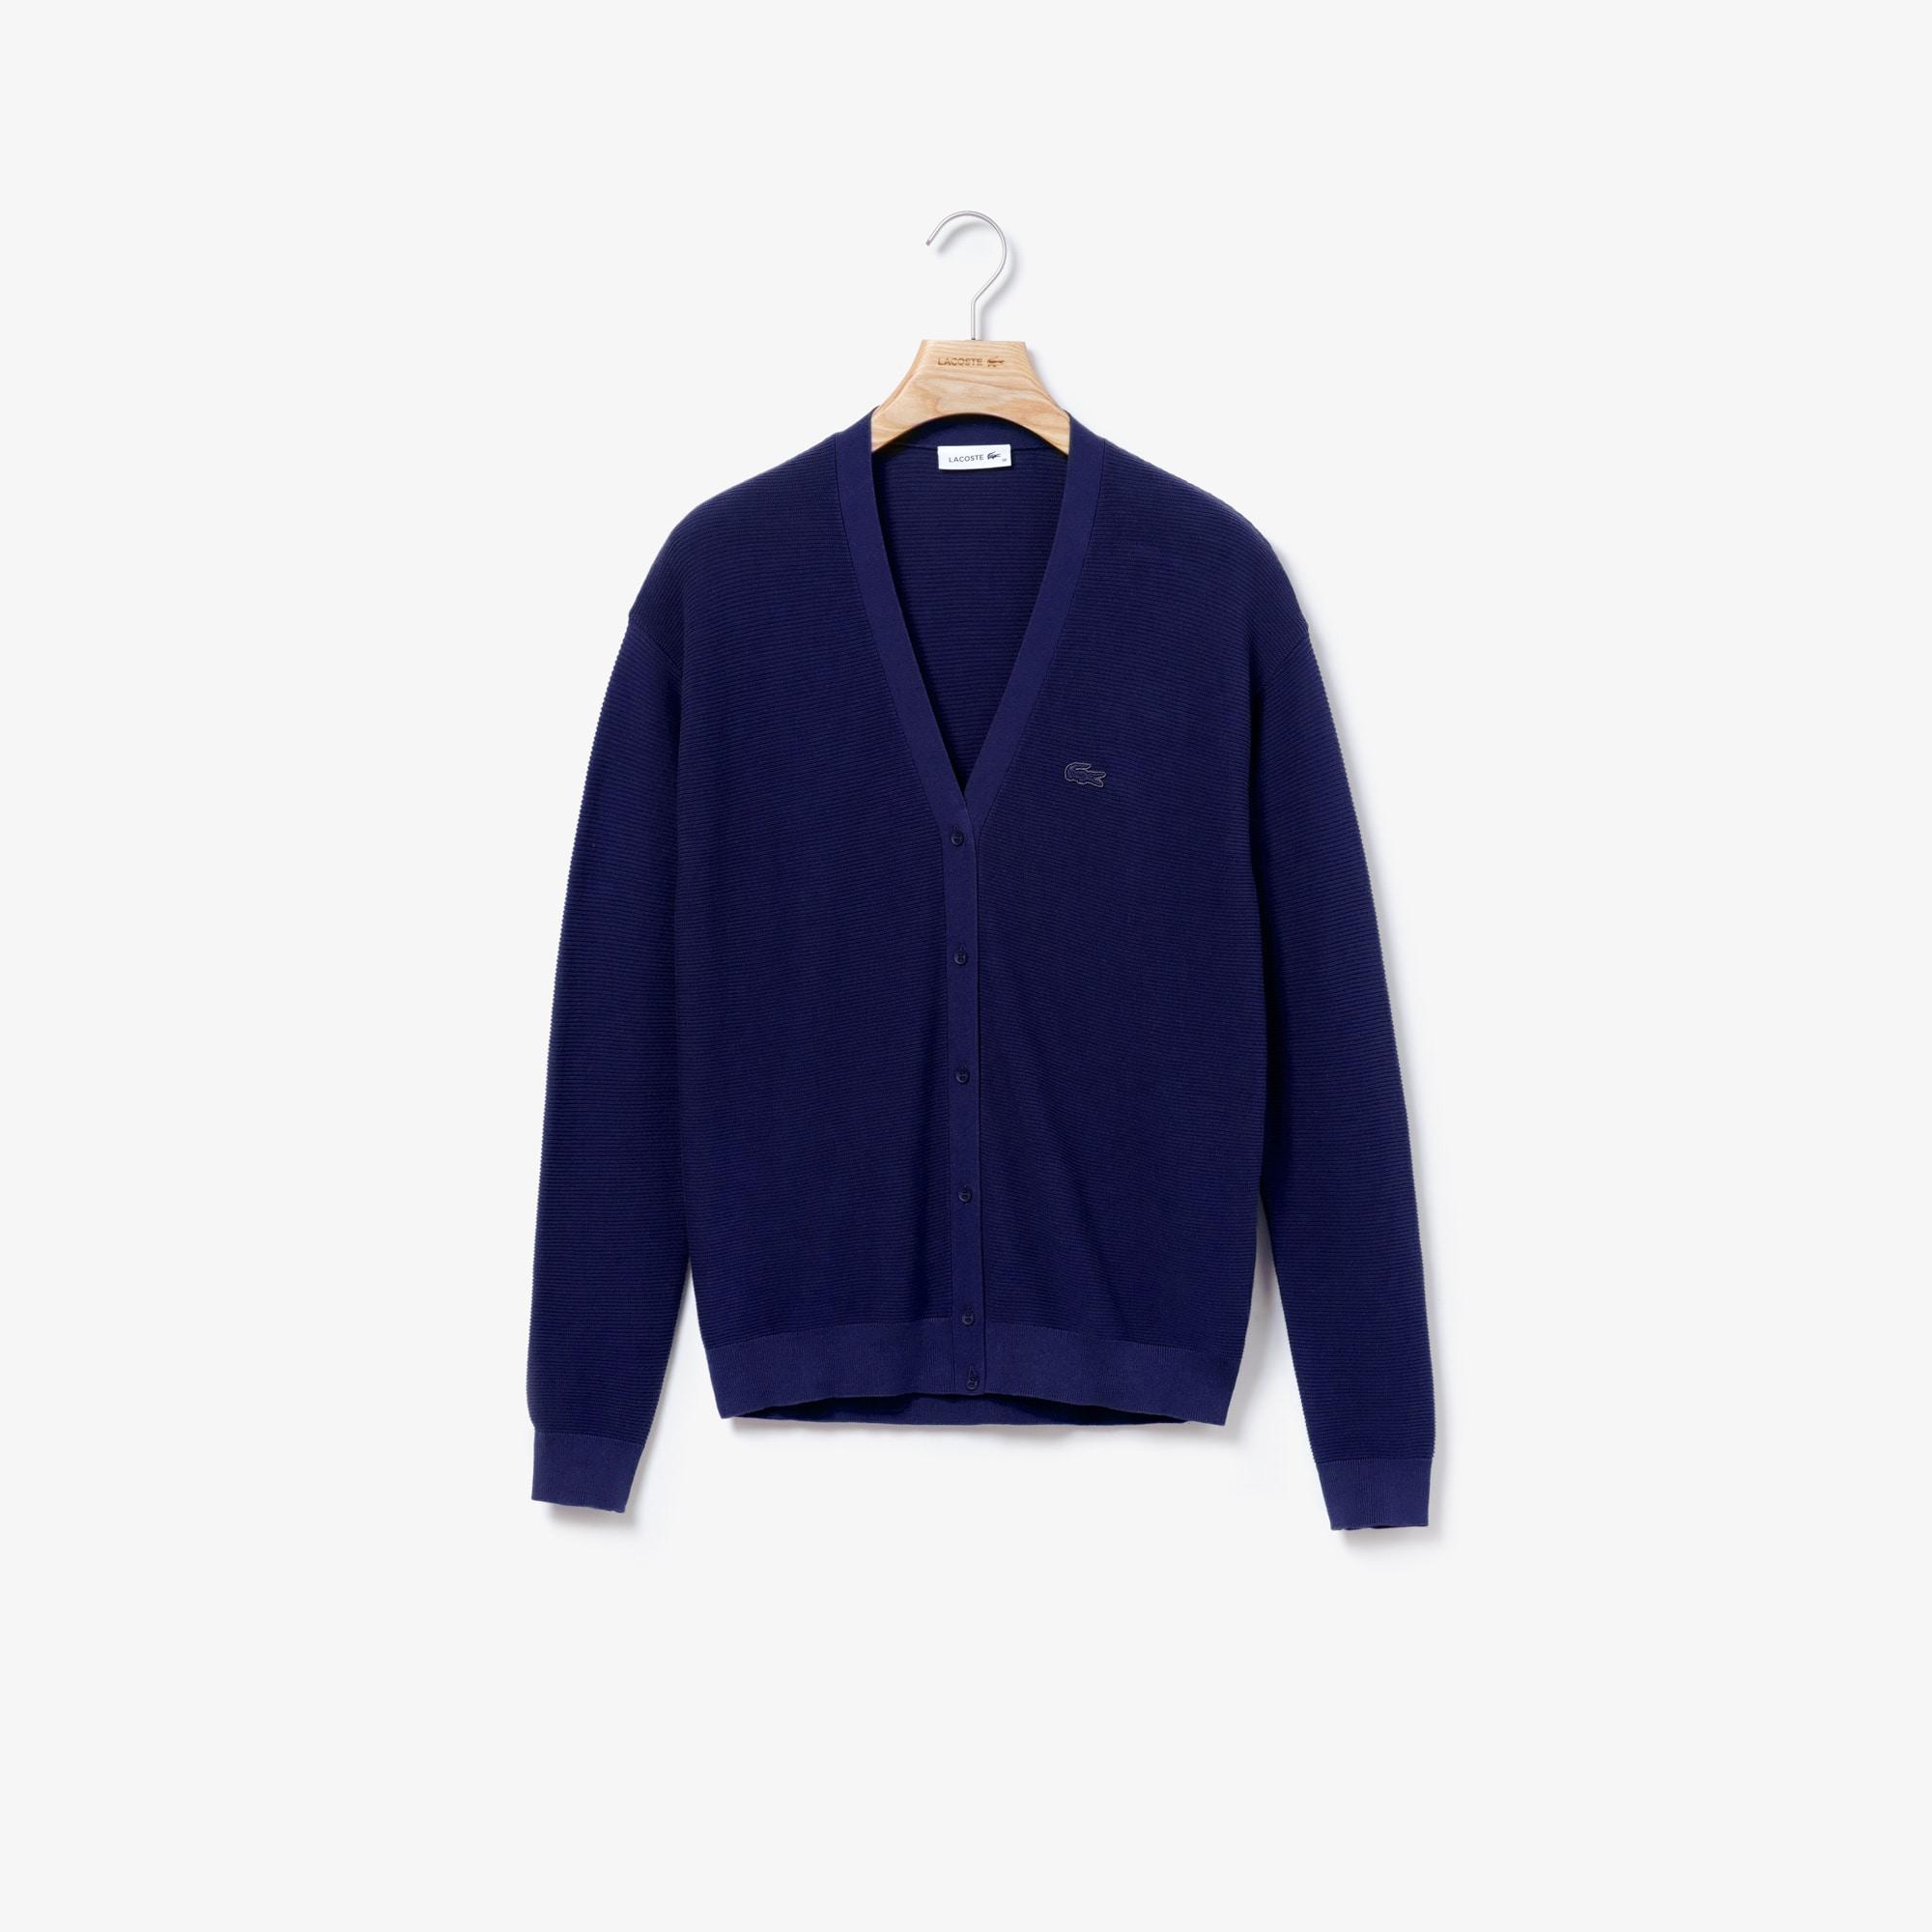 Women's Cotton Jersey Cardigan